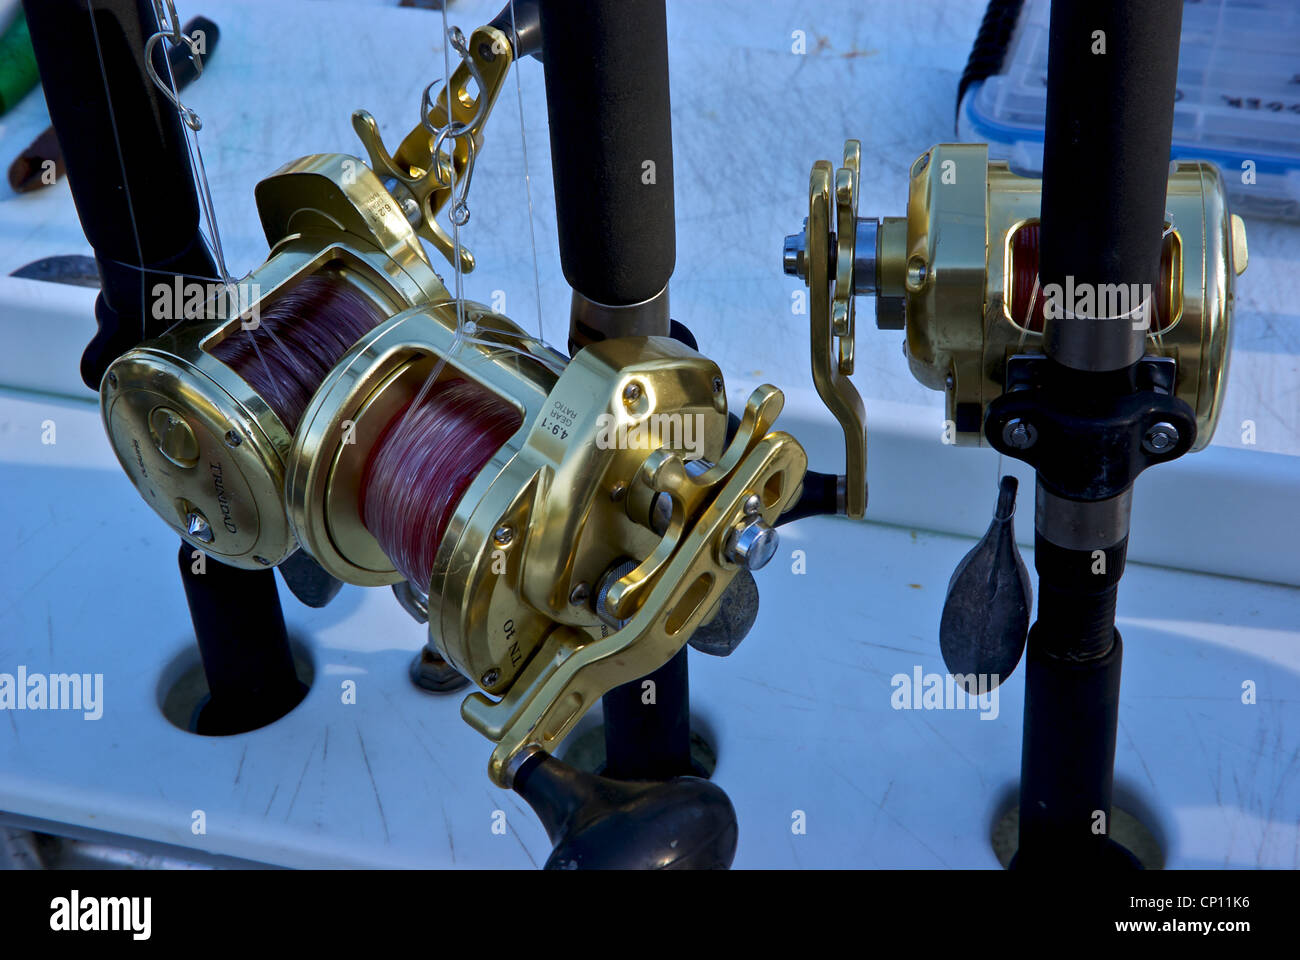 Shimano deepsea Trinidad heavy duty fishing reels rods weights barbed circle hooks - Stock Image